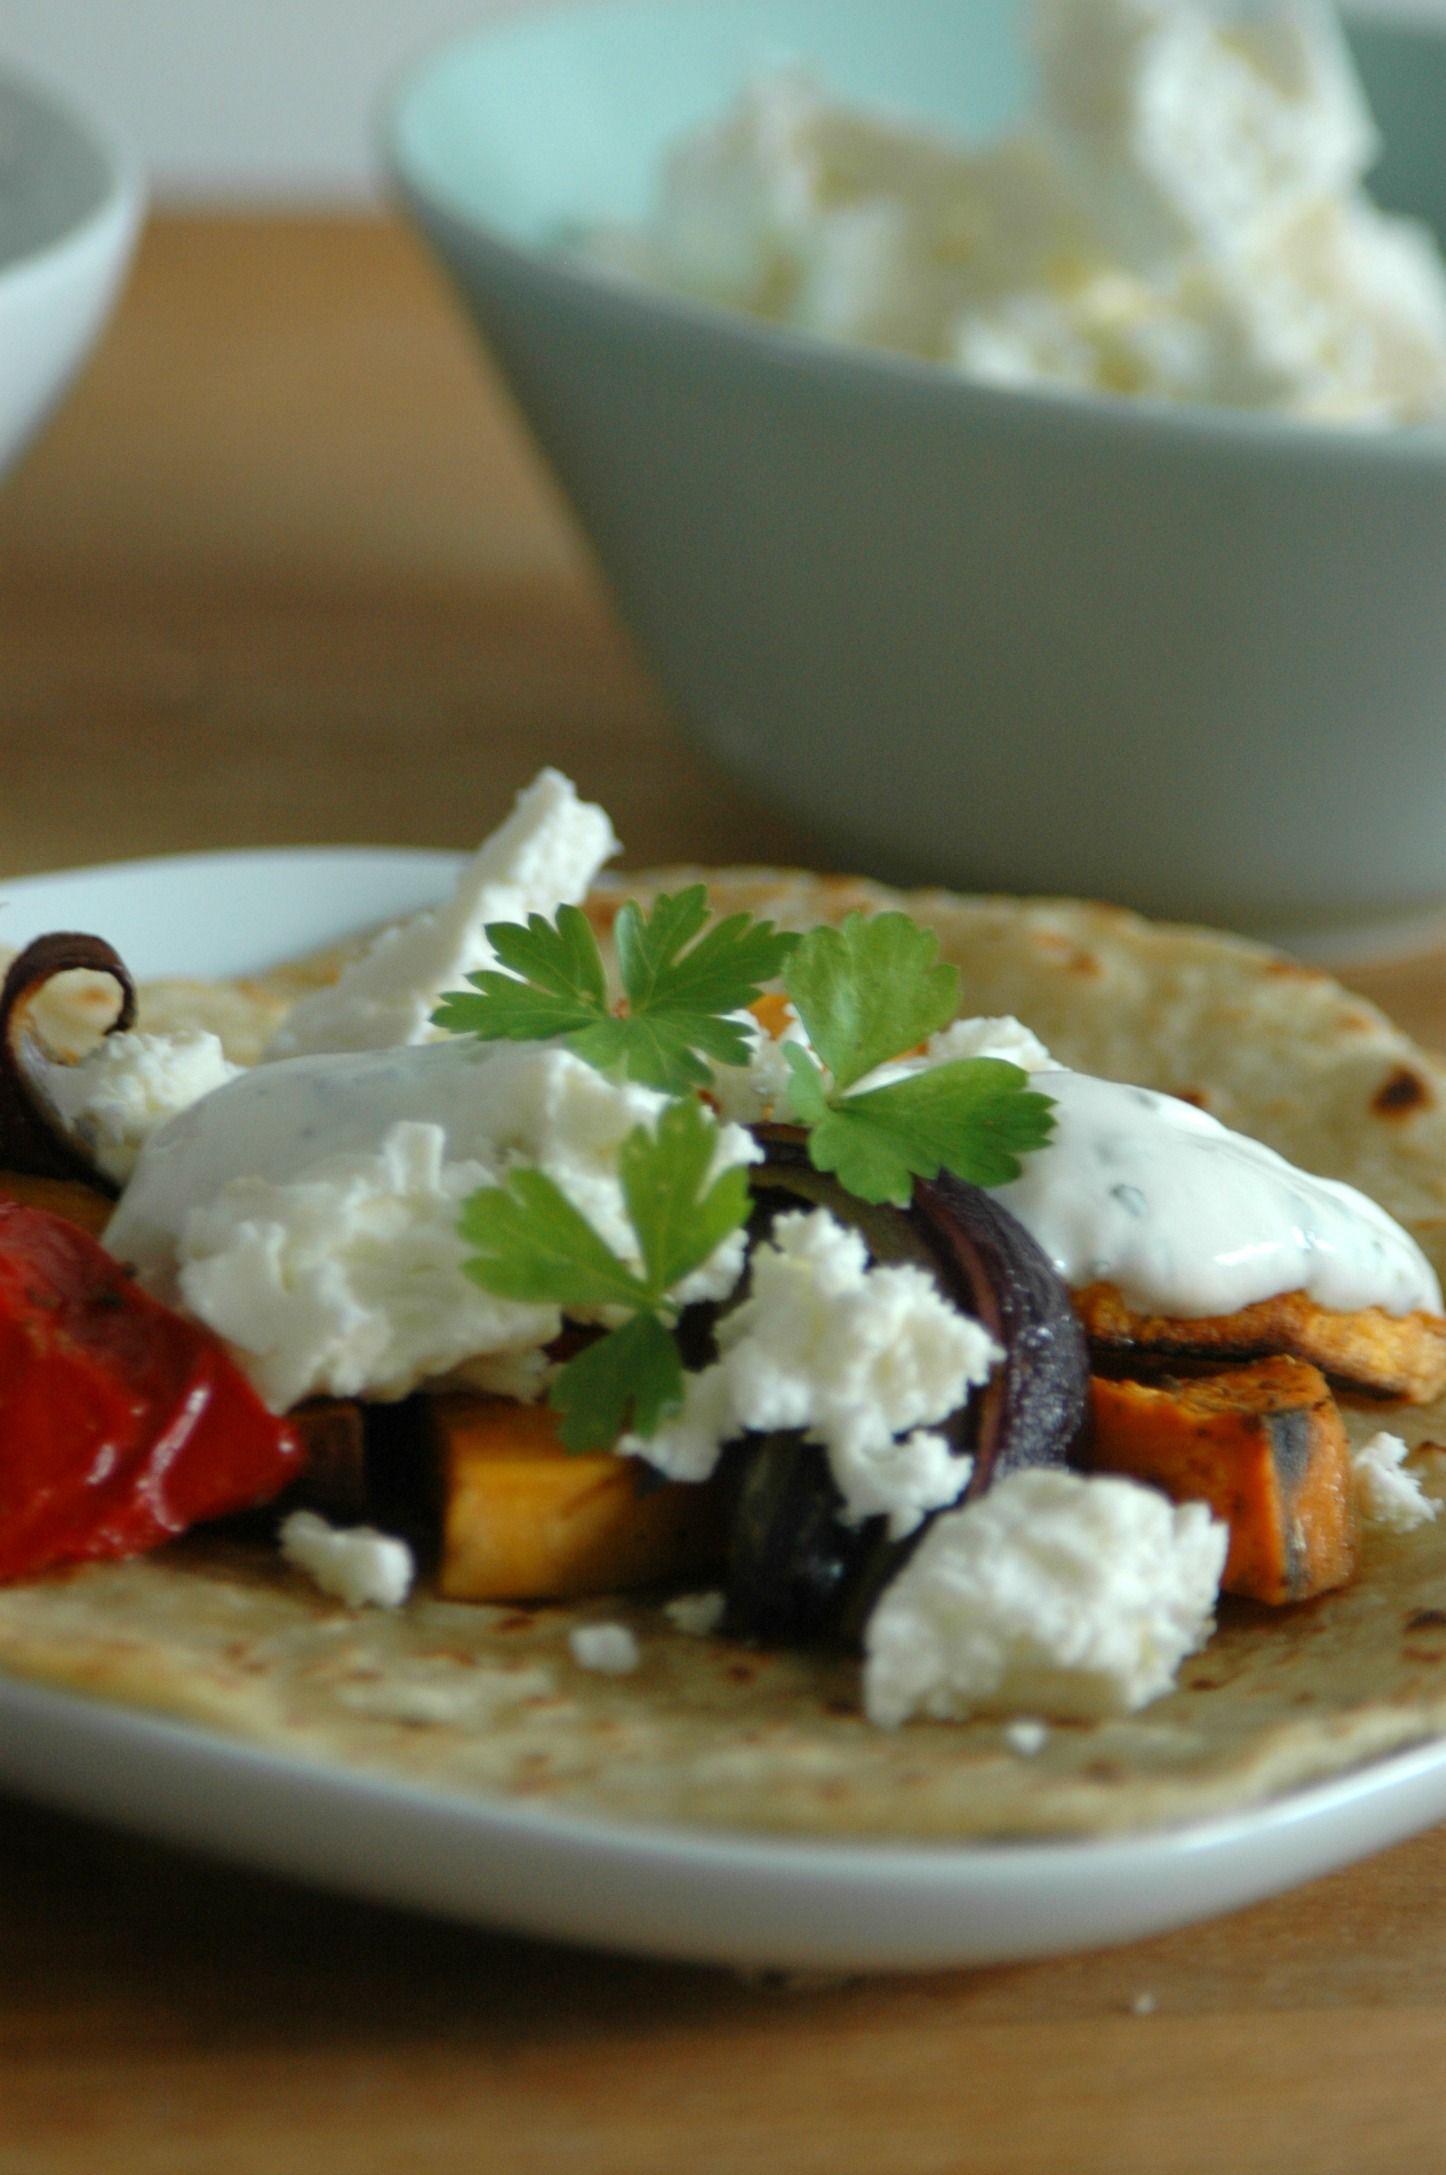 Wraps met geroosterde groente en feta (4 personen met restje groente)